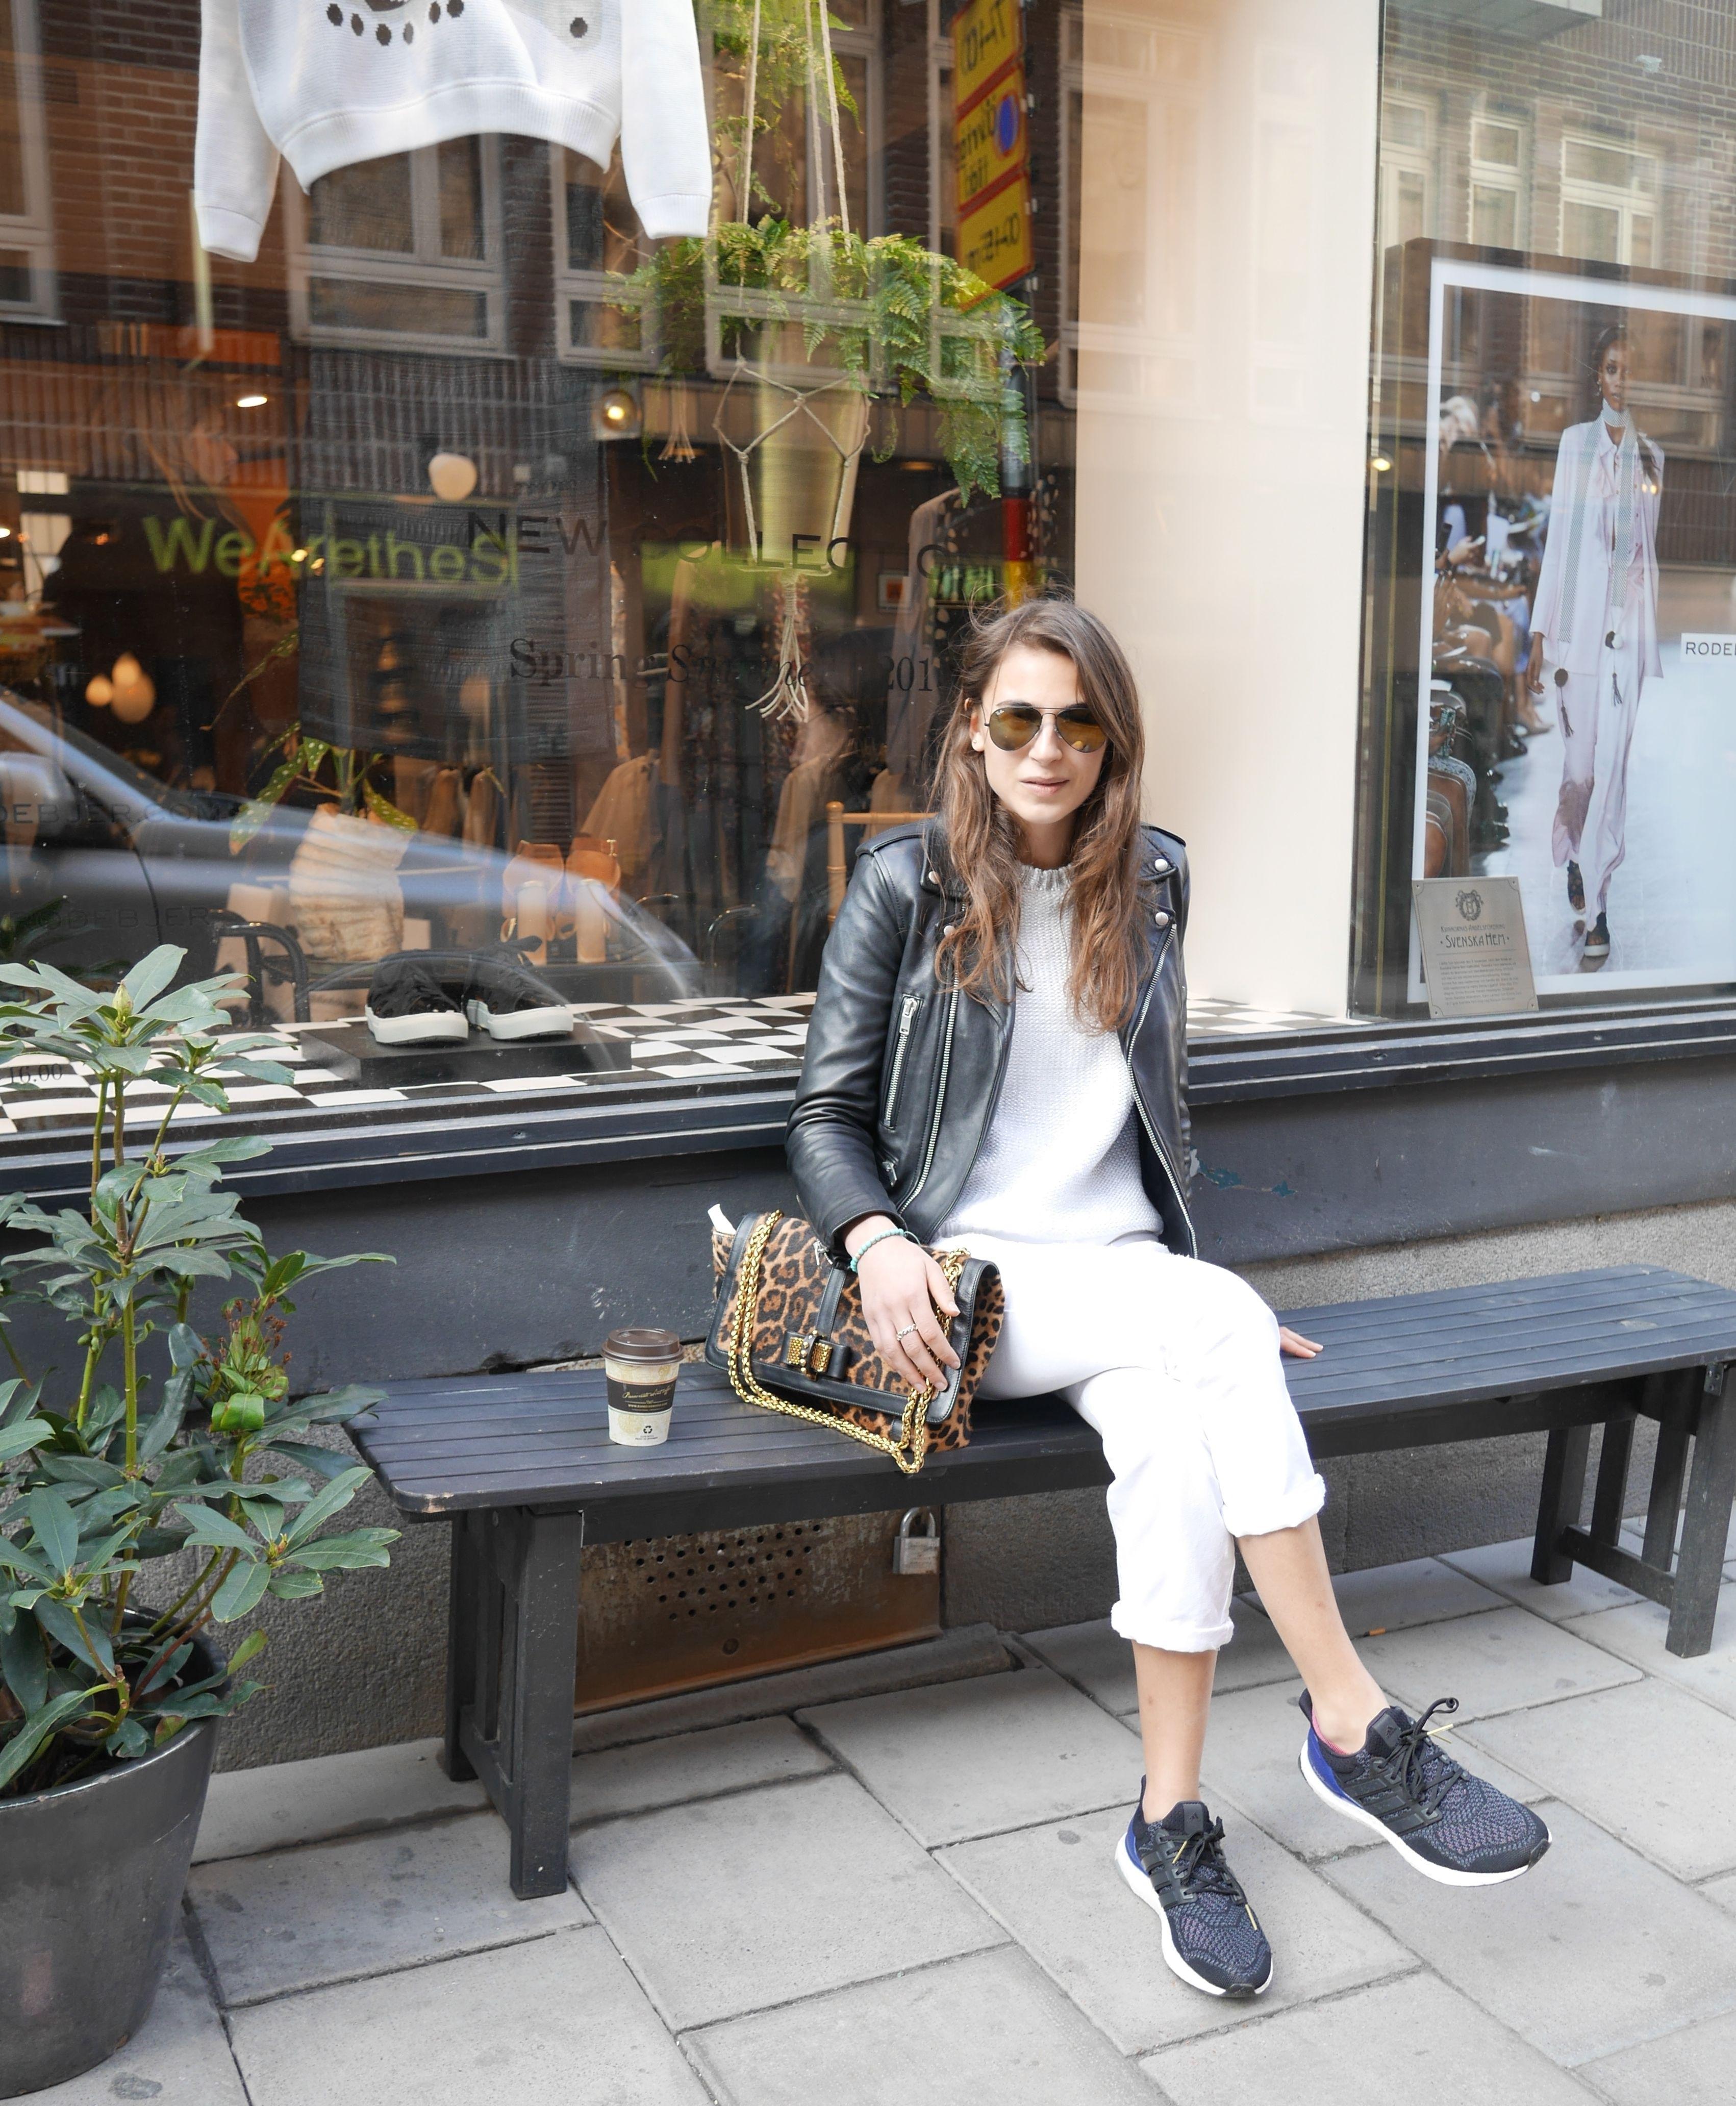 stockholm, adidas, inwear, ultraboost, running shoe, saint laurent, 5unites,